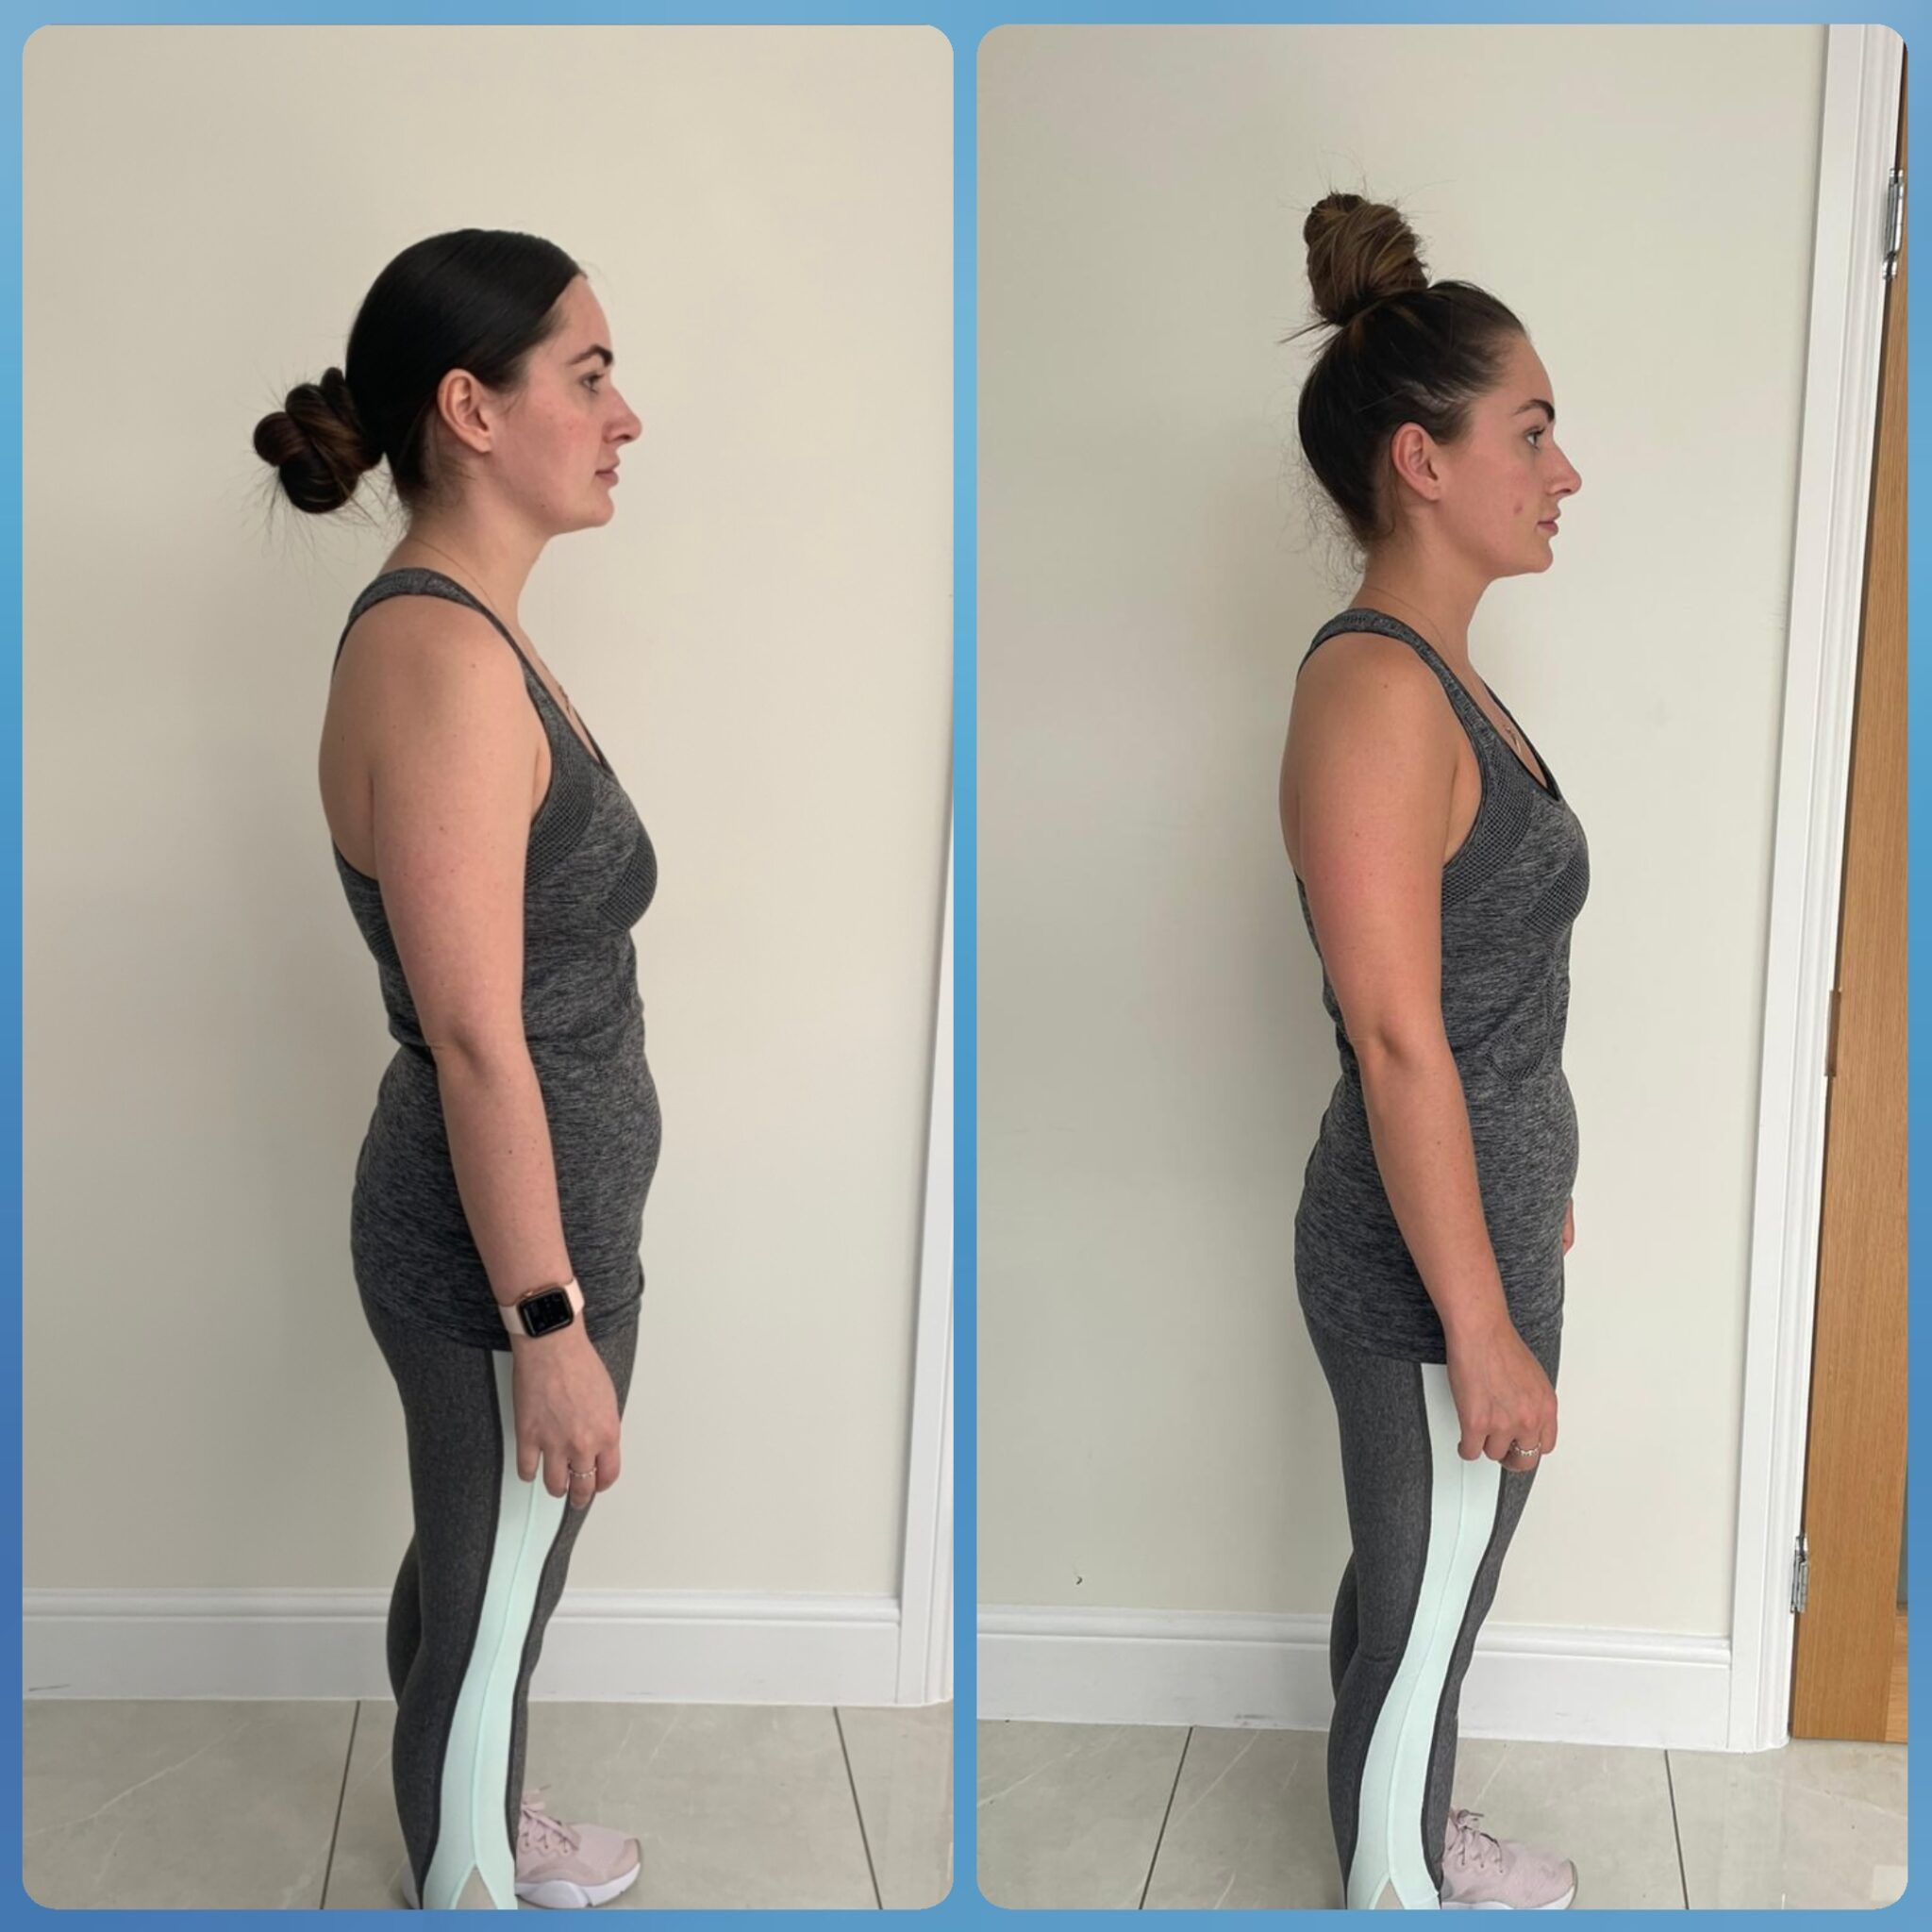 Kiera 12 week transformation 1